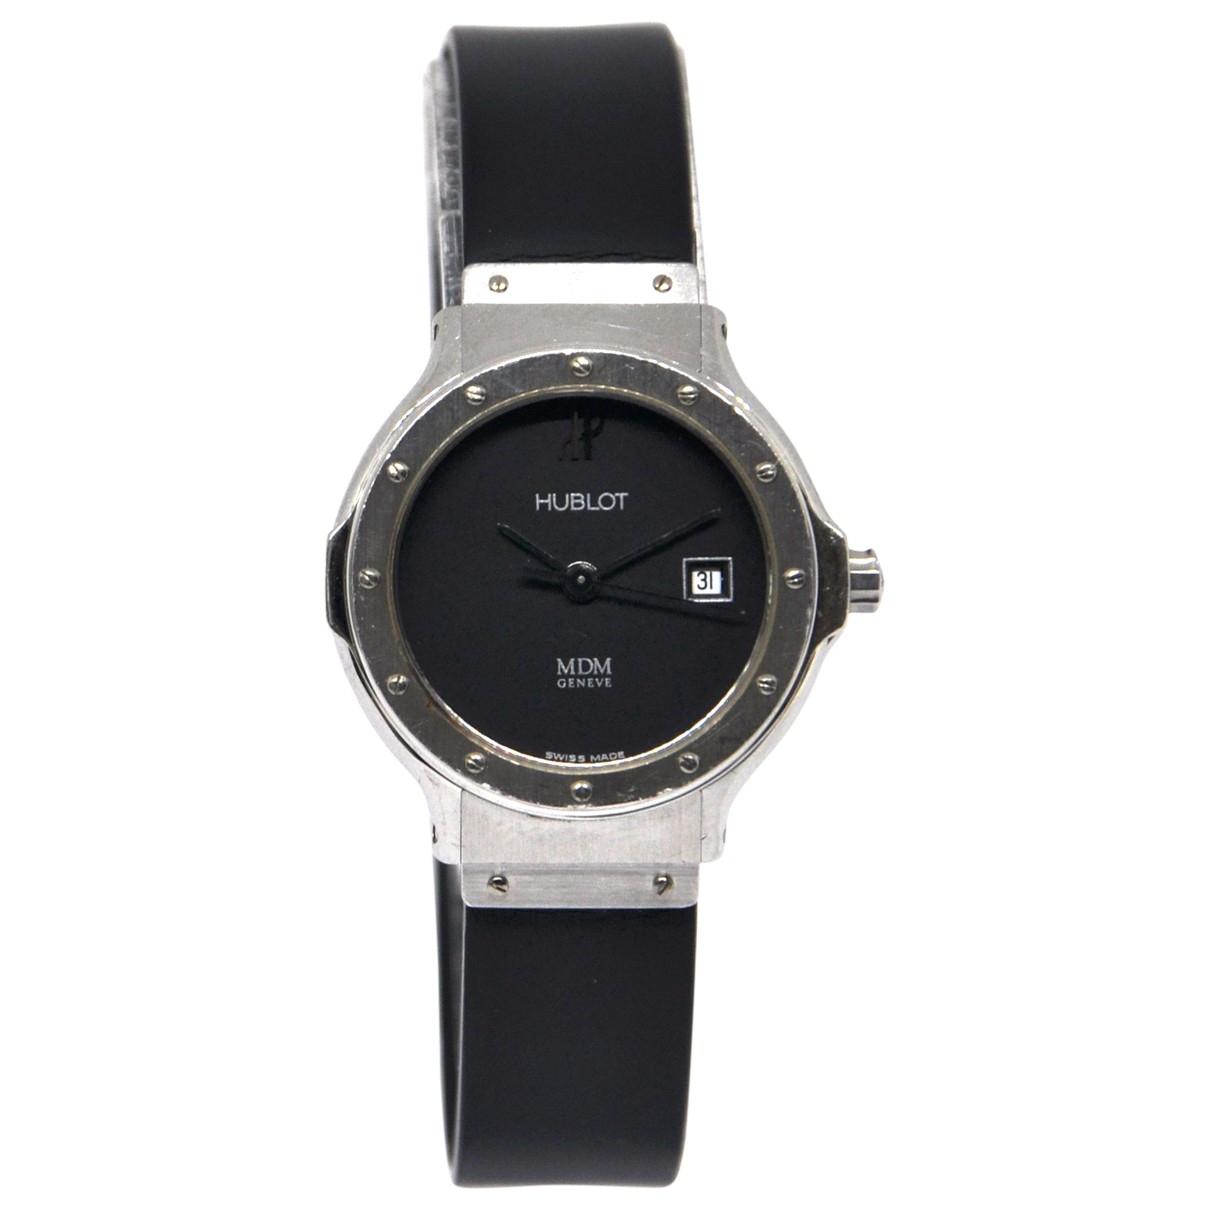 Reloj MDM Hublot